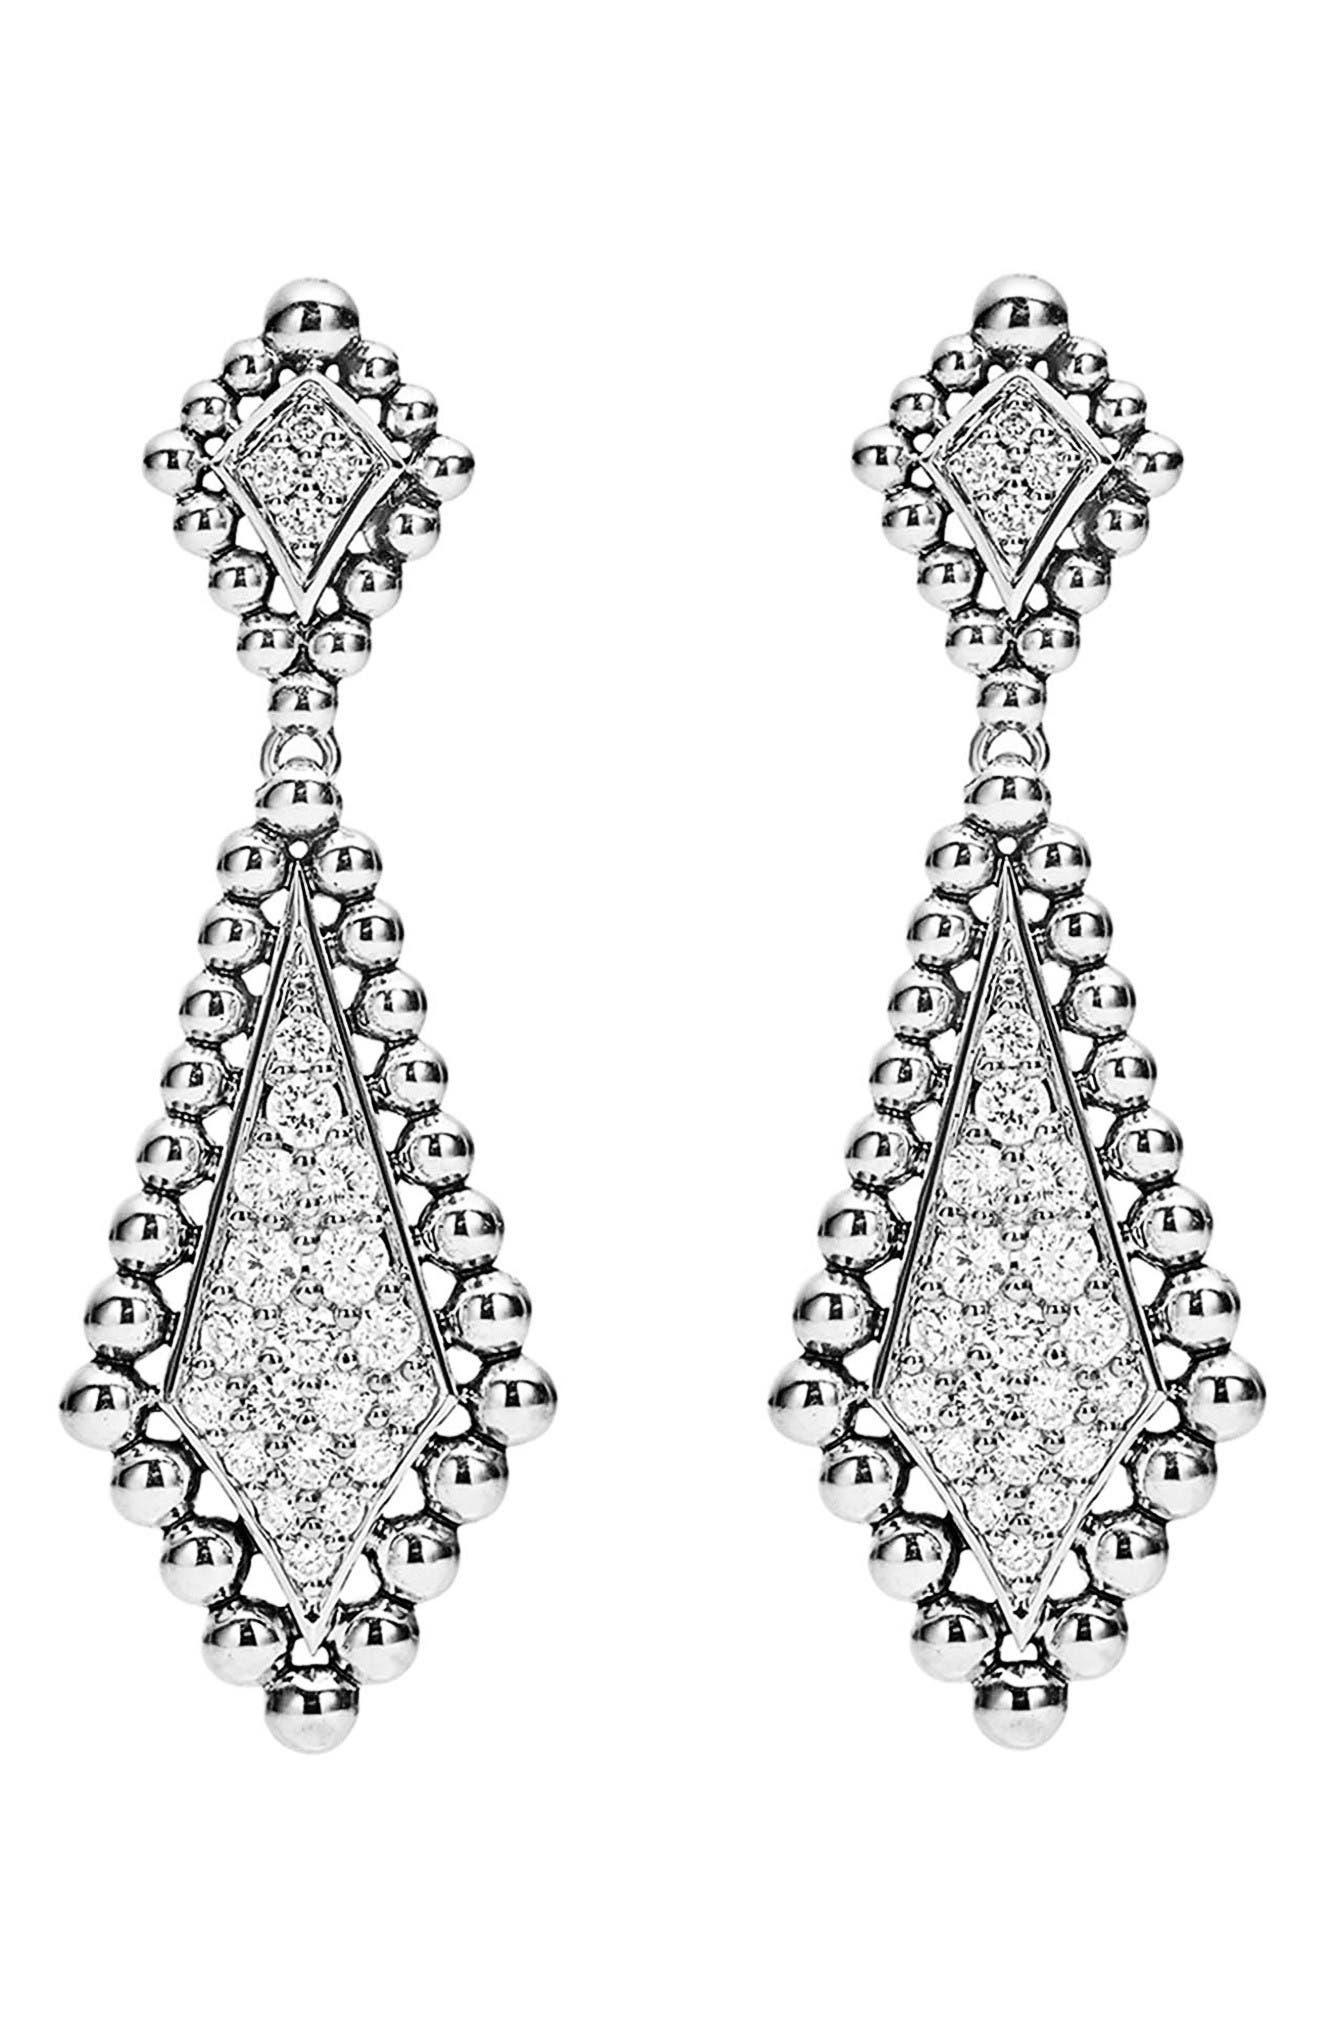 Caviar Spark Diamond Drop Earrings,                             Alternate thumbnail 2, color,                             Silver/ Diamond